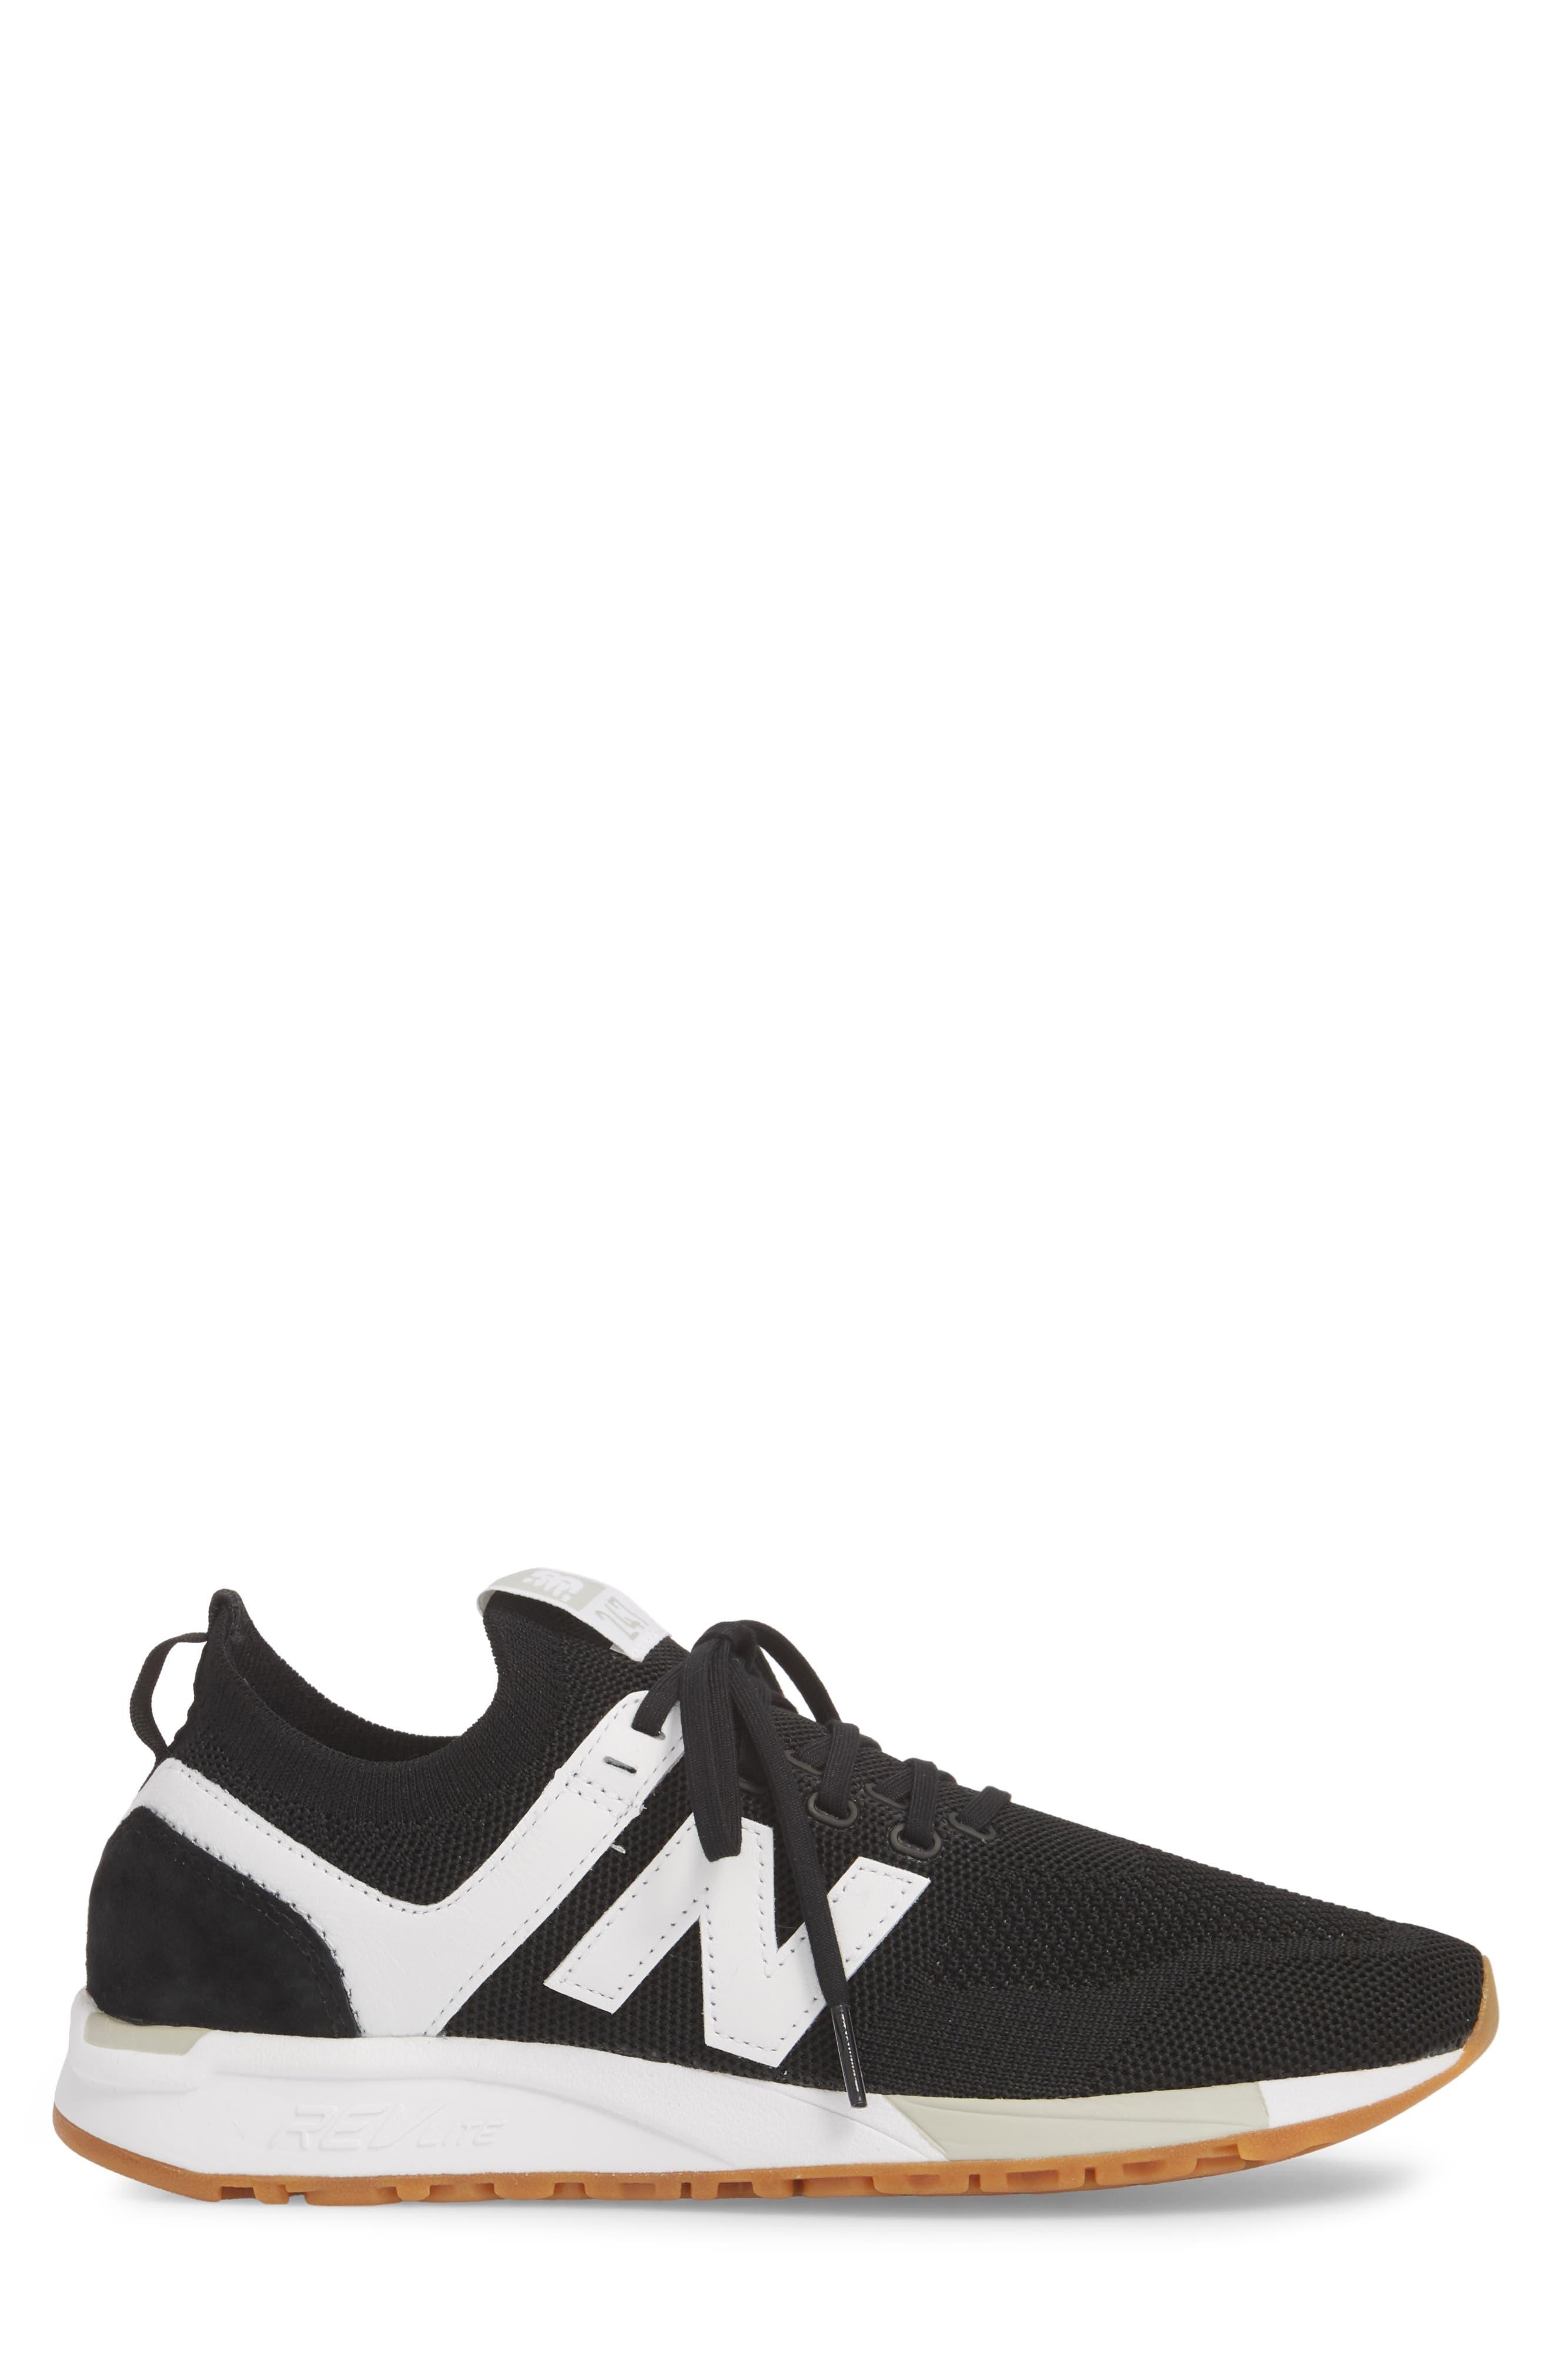 247 Decon Sneaker,                             Alternate thumbnail 3, color,                             001